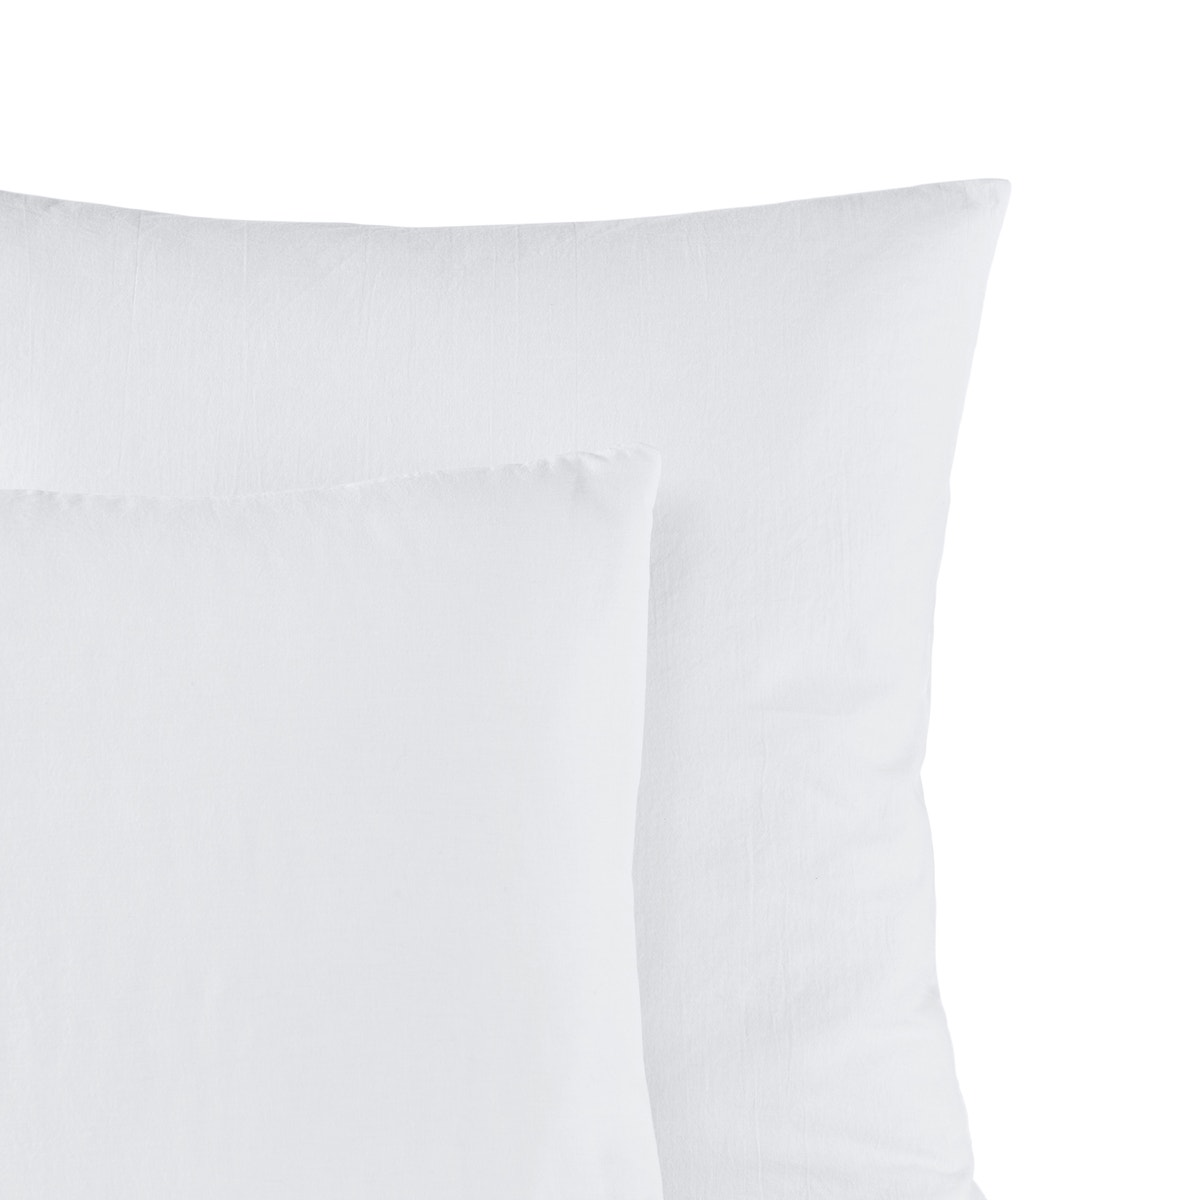 Piki オーガニックコットン 枕カバー